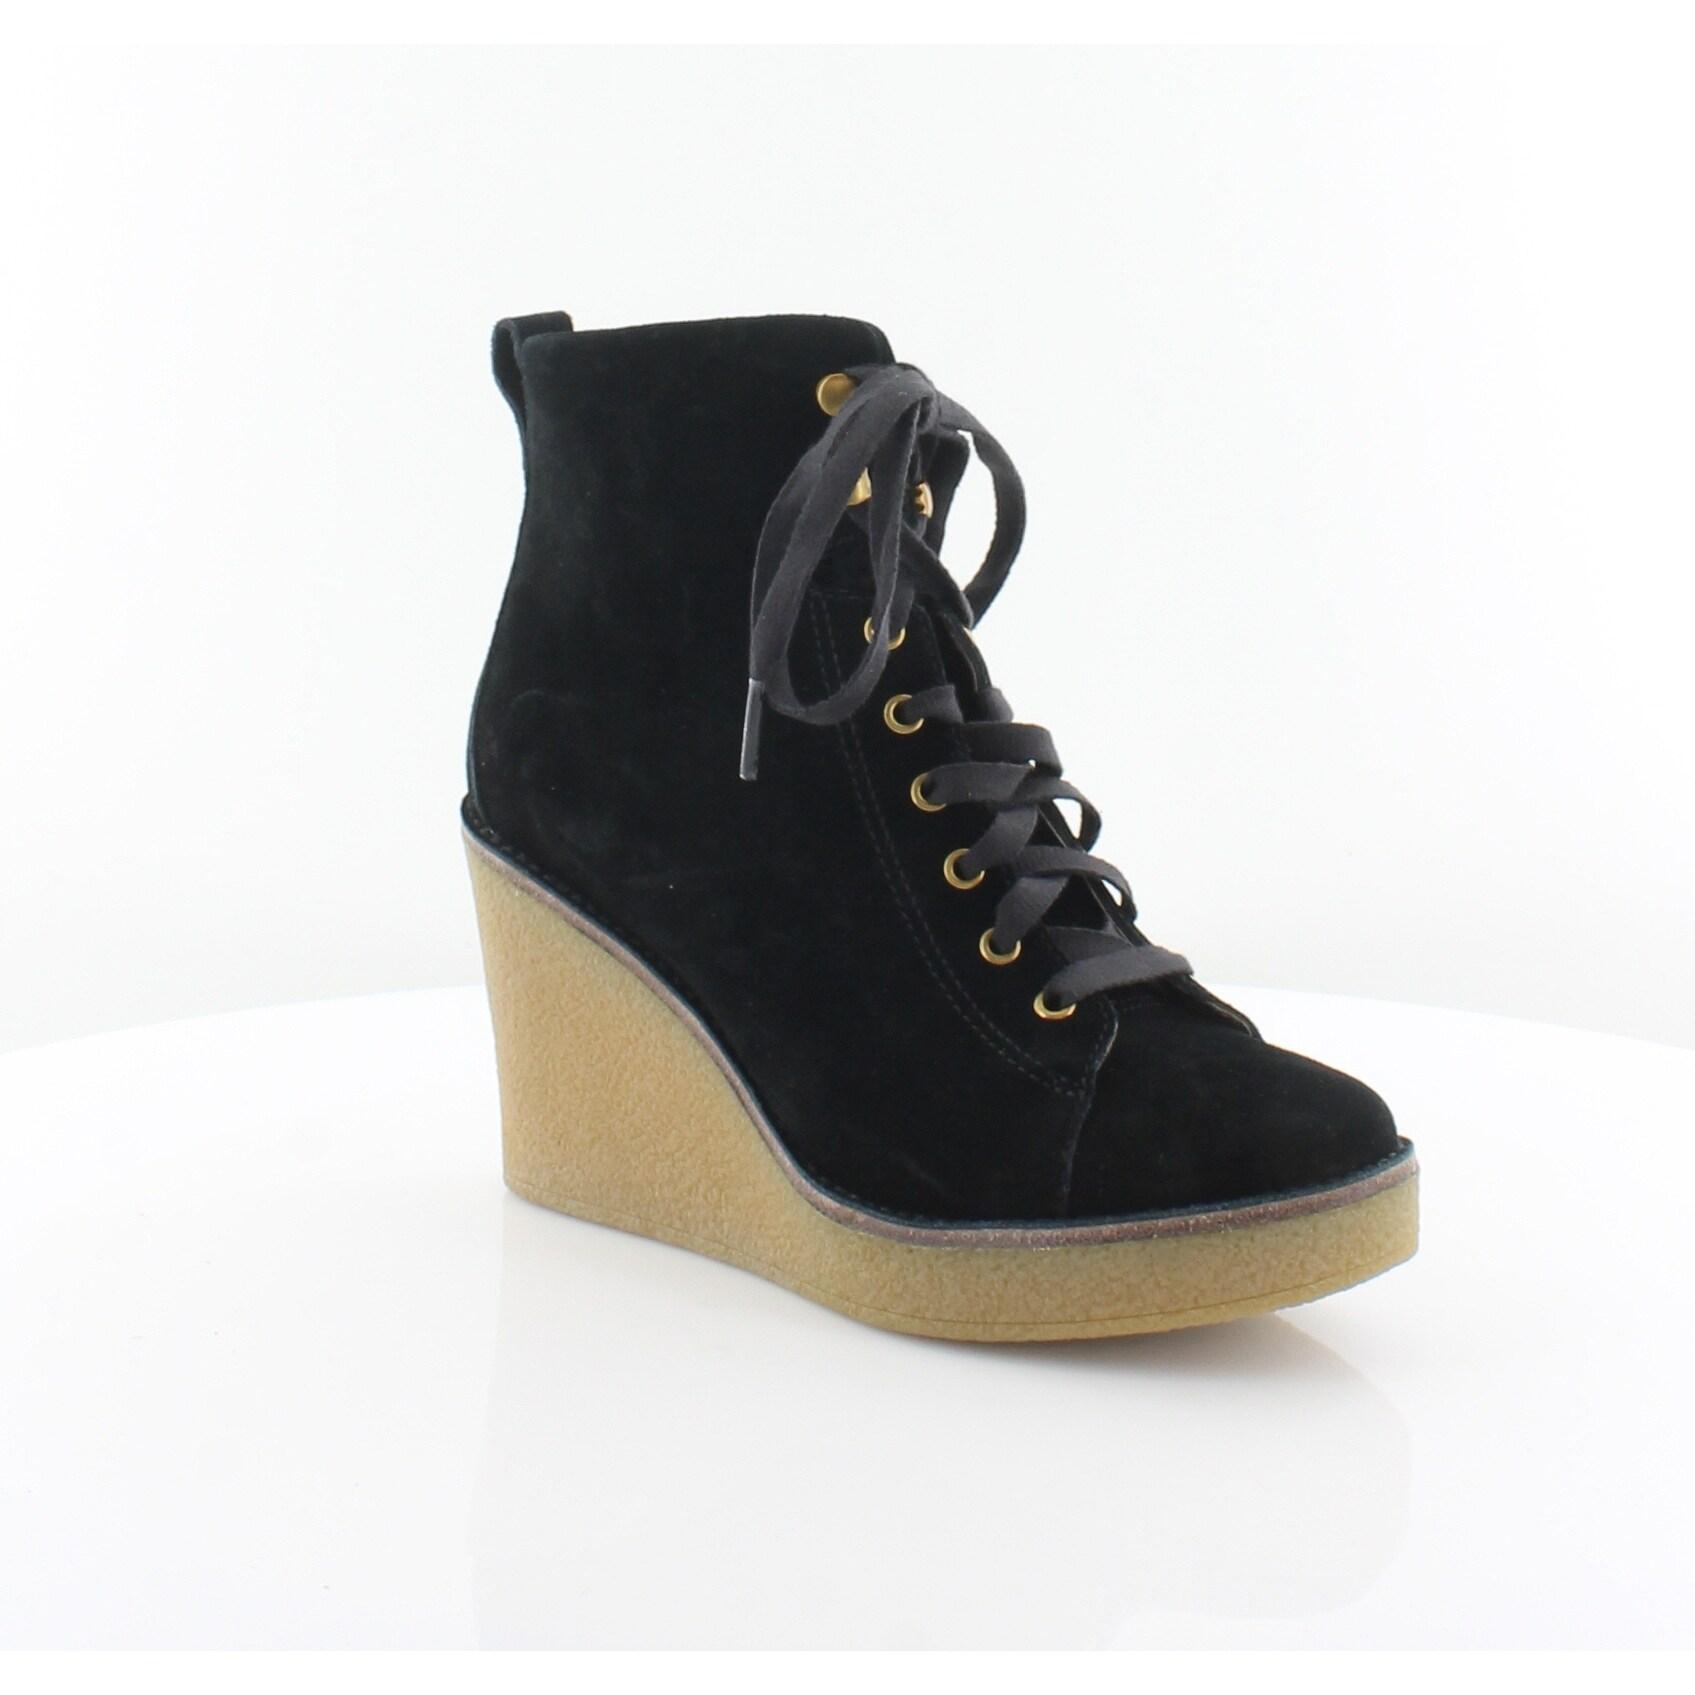 7d04c38e271 Buy High Heel UGG Women's Boots Online at Overstock | Our Best ...